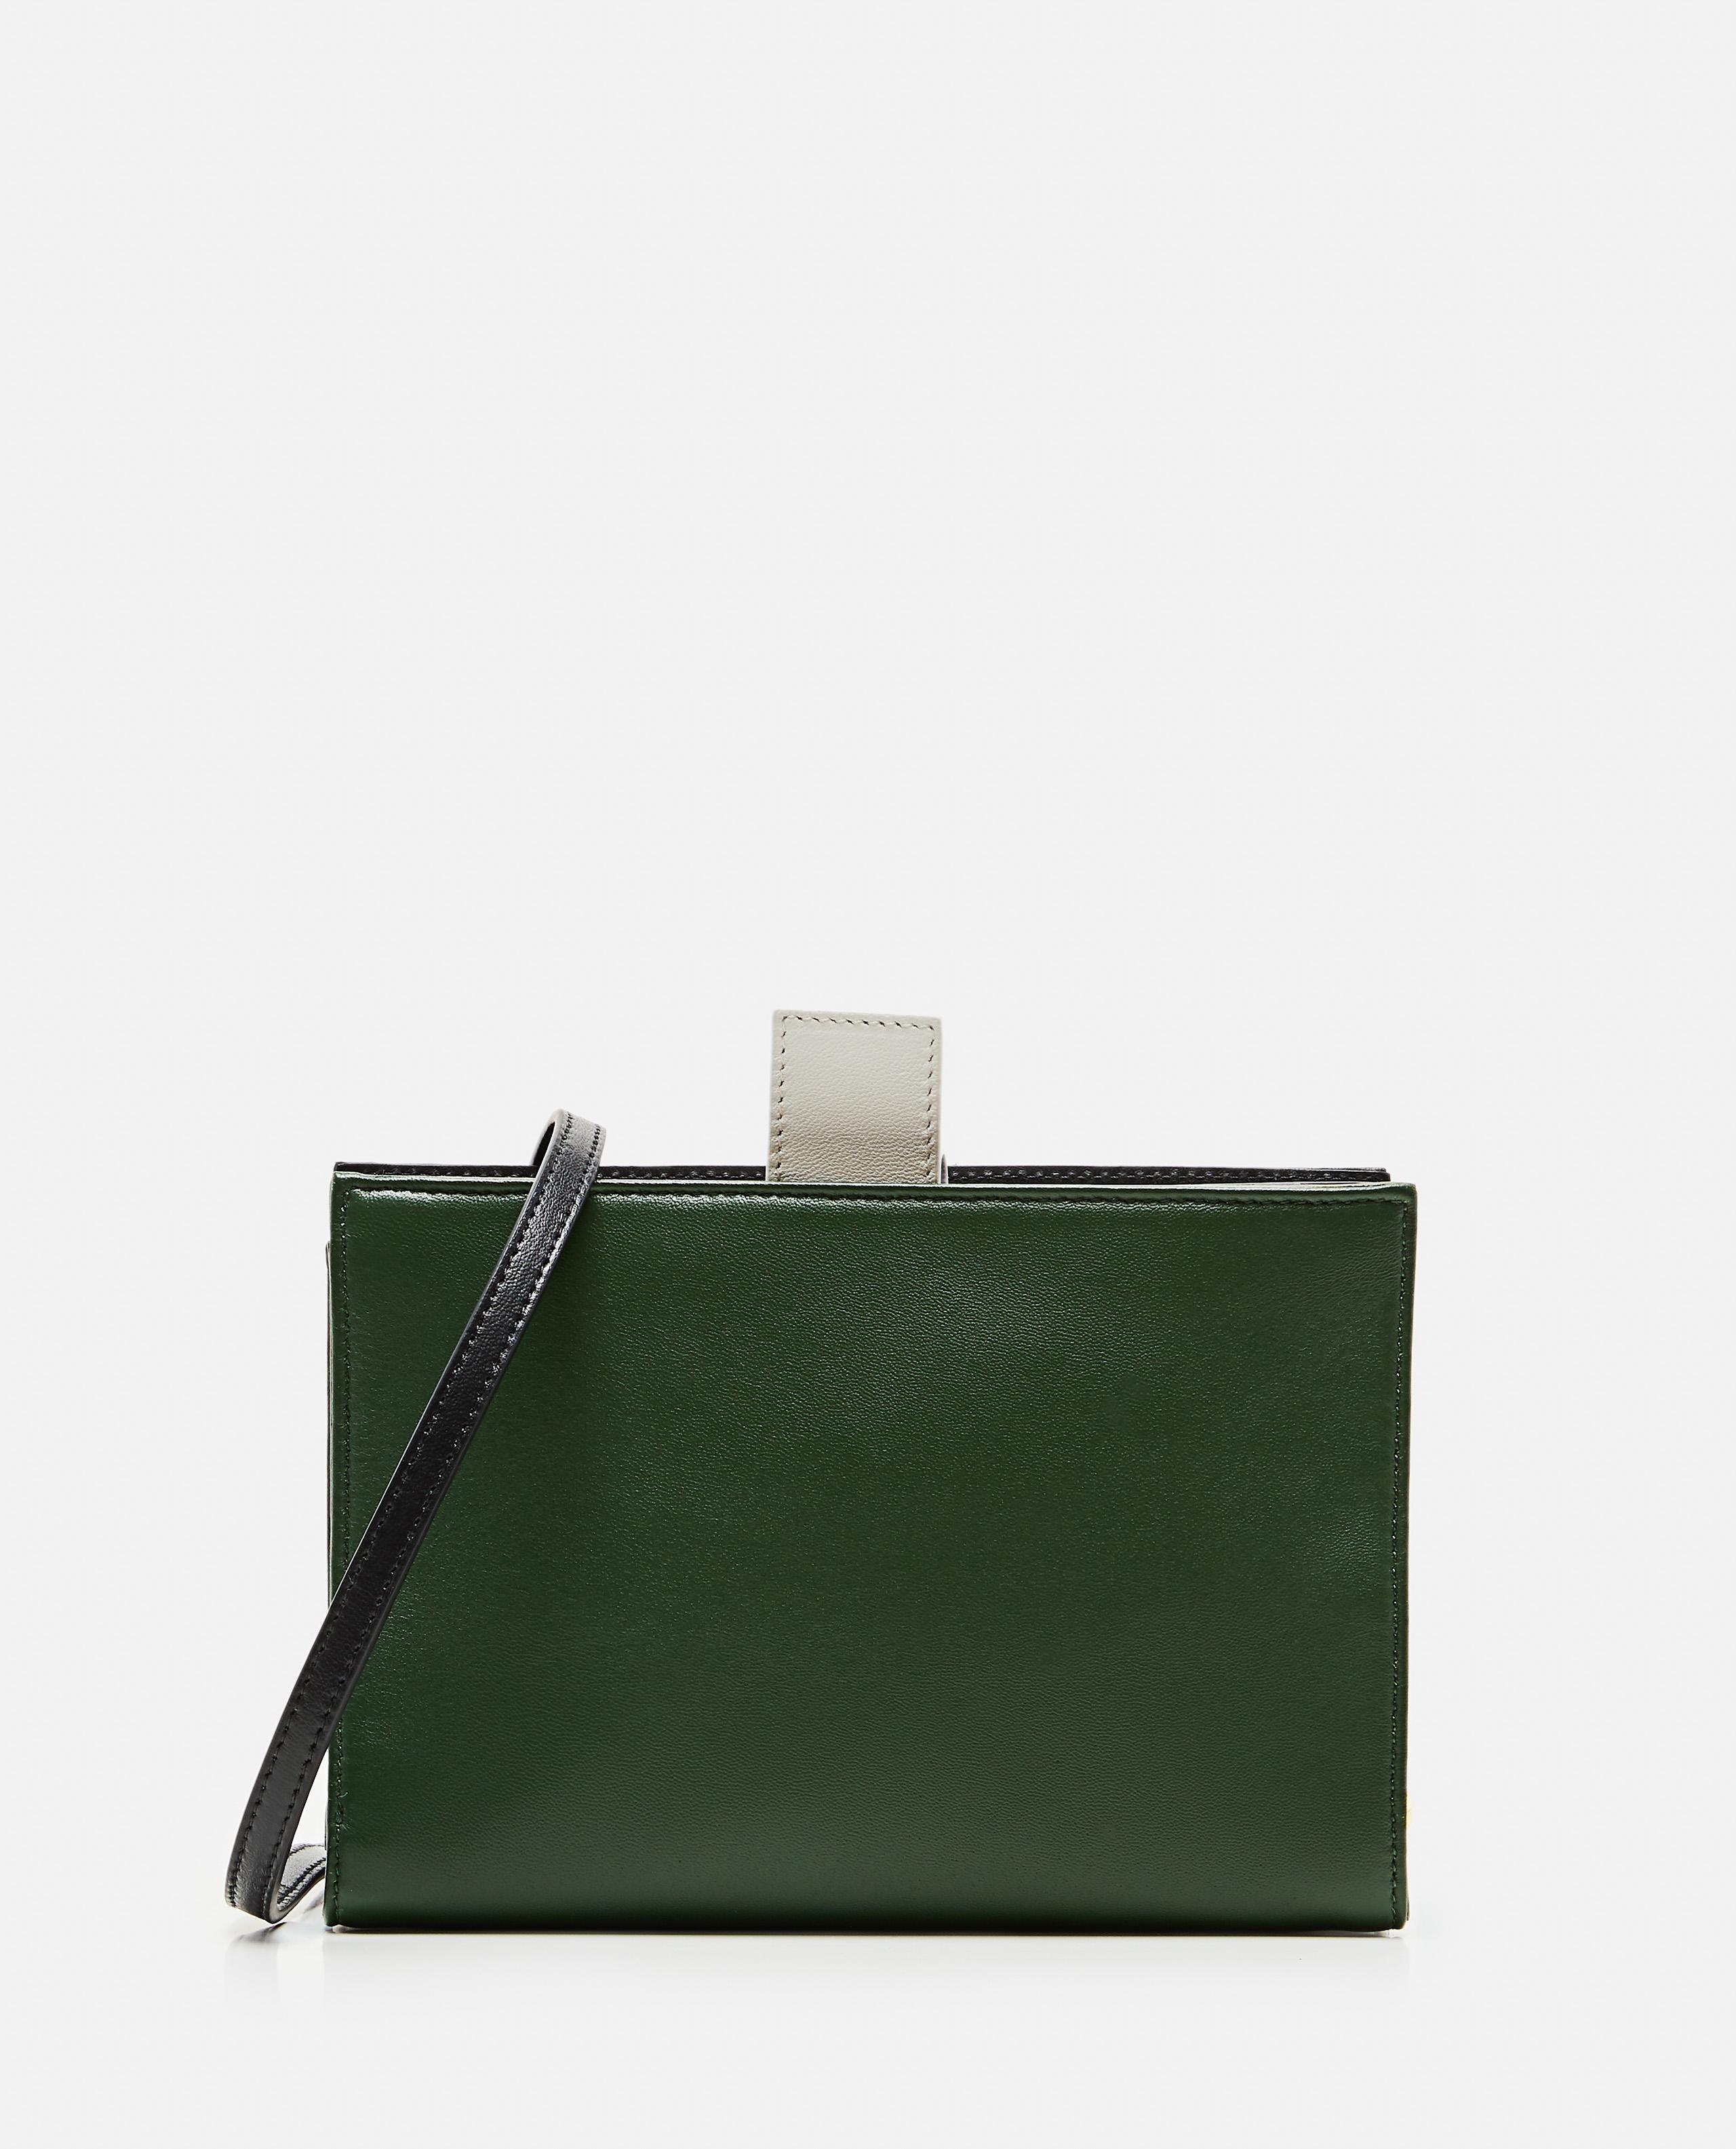 Two-tone color block shoulder bag